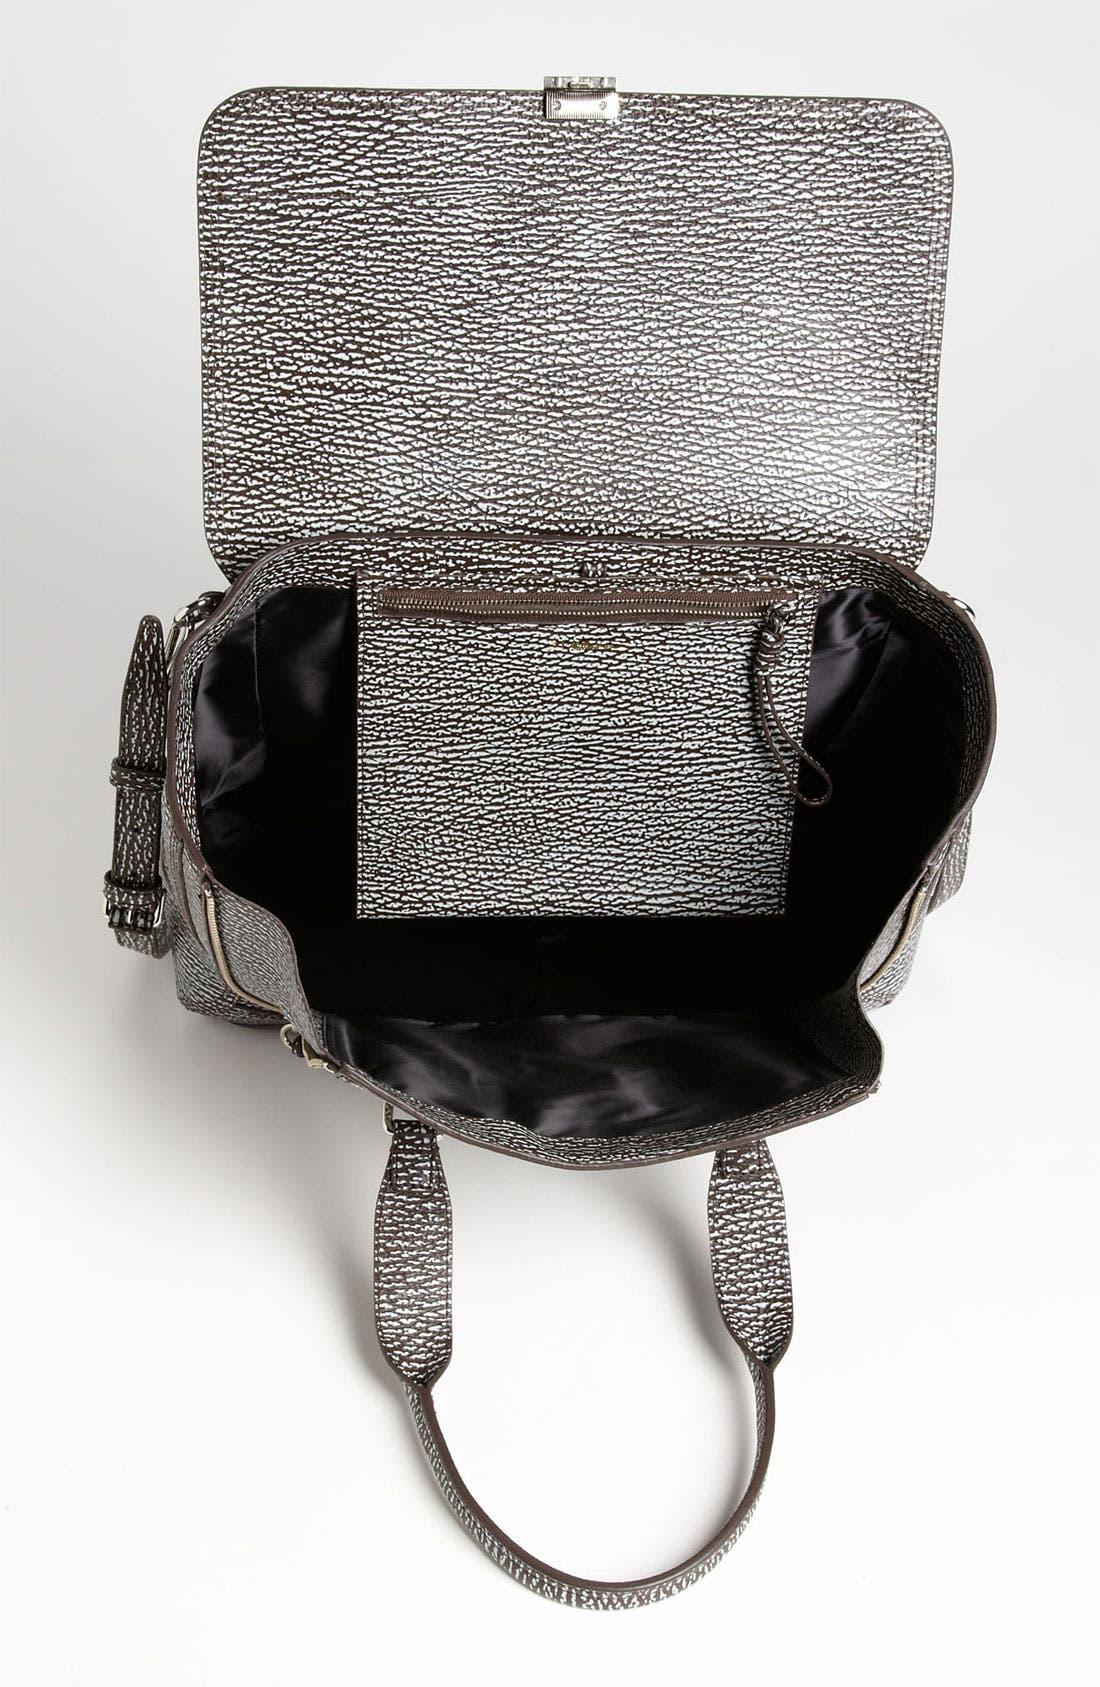 Alternate Image 3  - 3.1 Phillip Lim 'Pashli' Leather Satchel